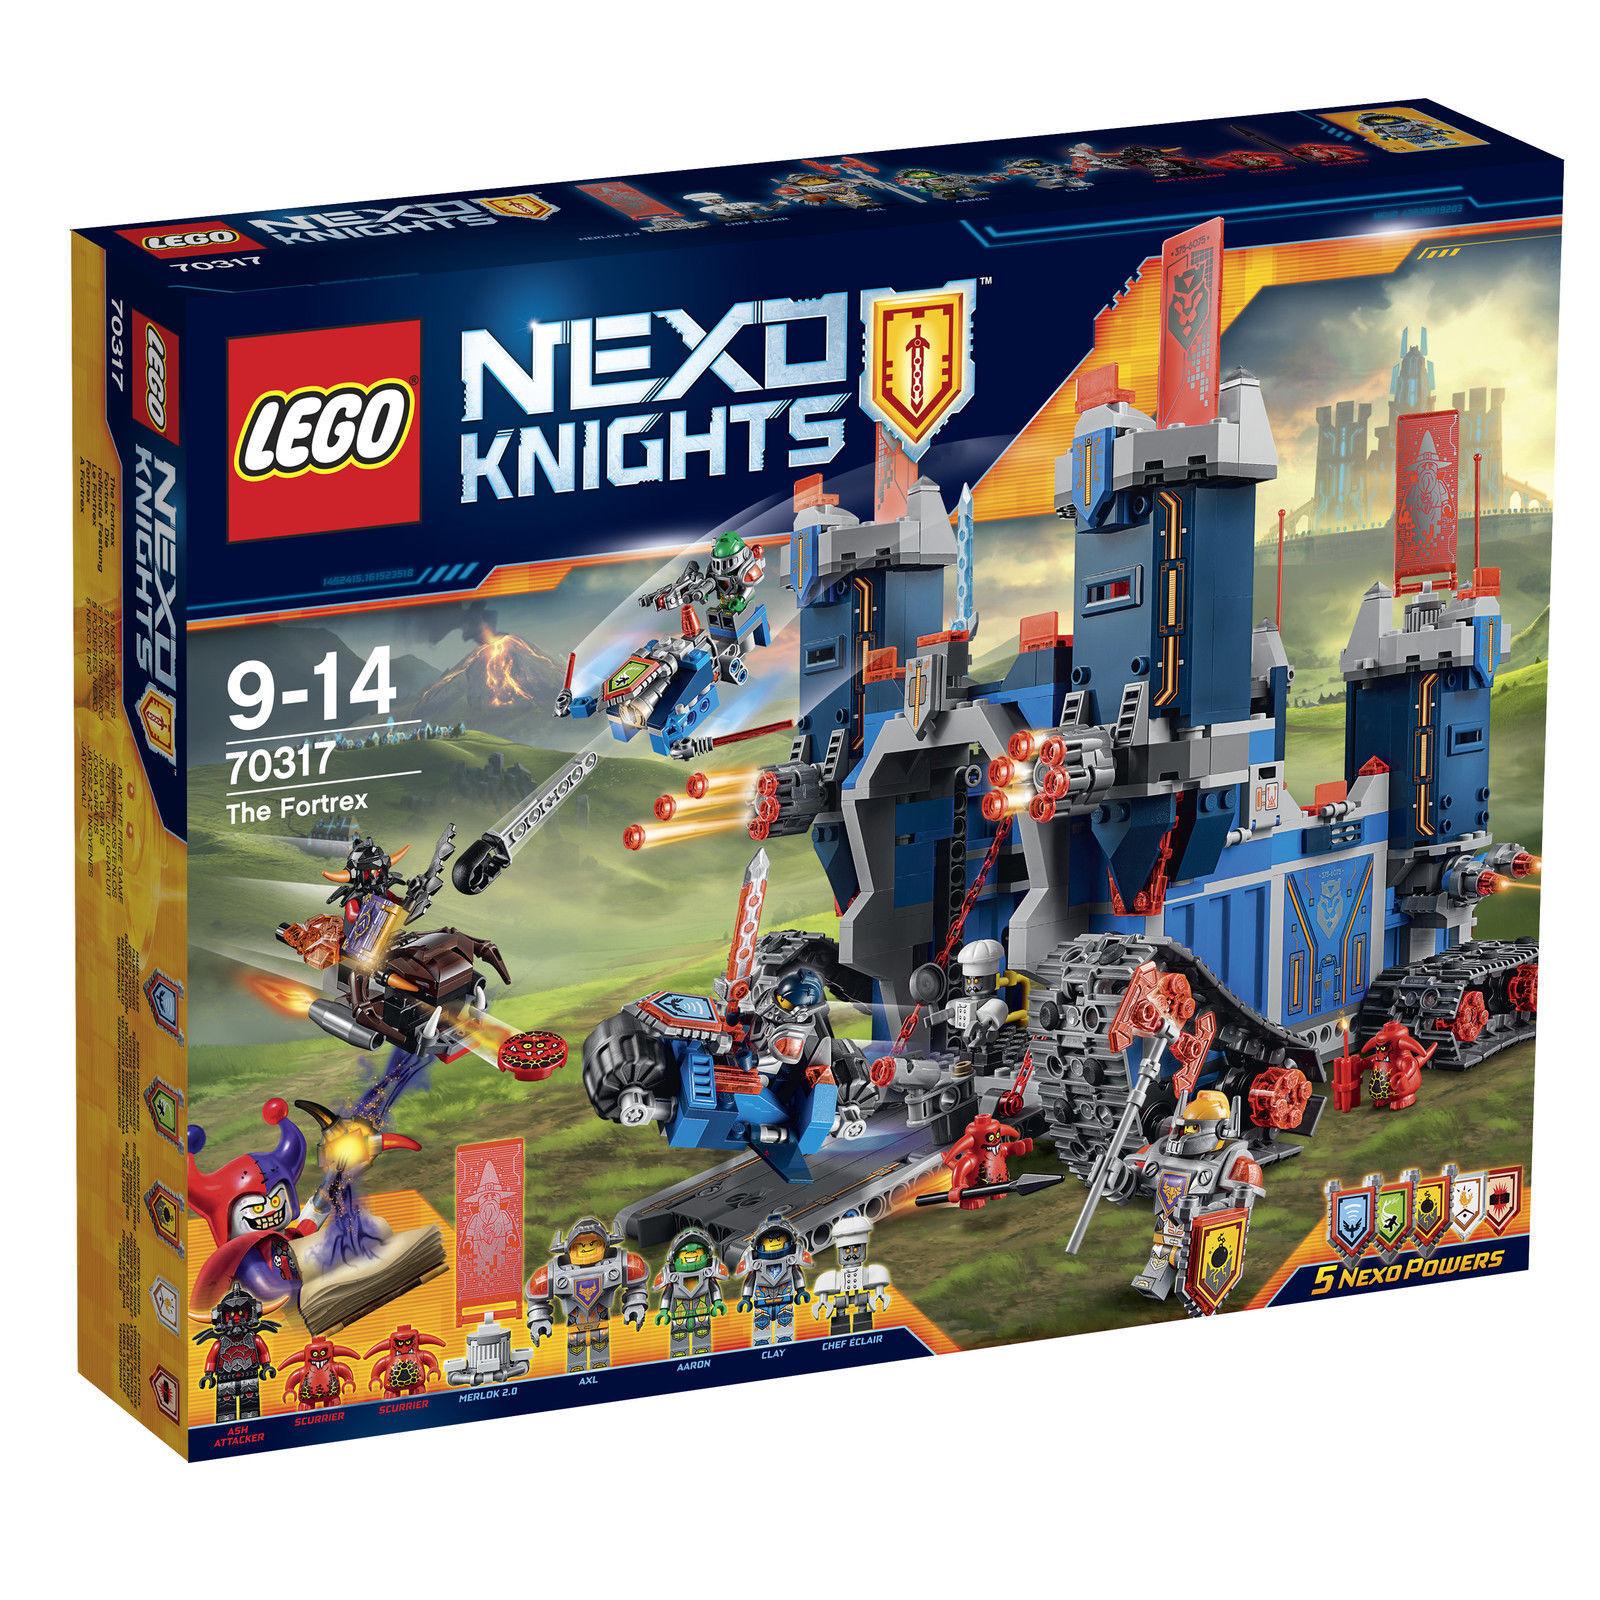 LEGO NEXO KNIGHTS (70317) The Fortrex - Die rollende Festung Festung Festung - NEU & OVP ab5c8b